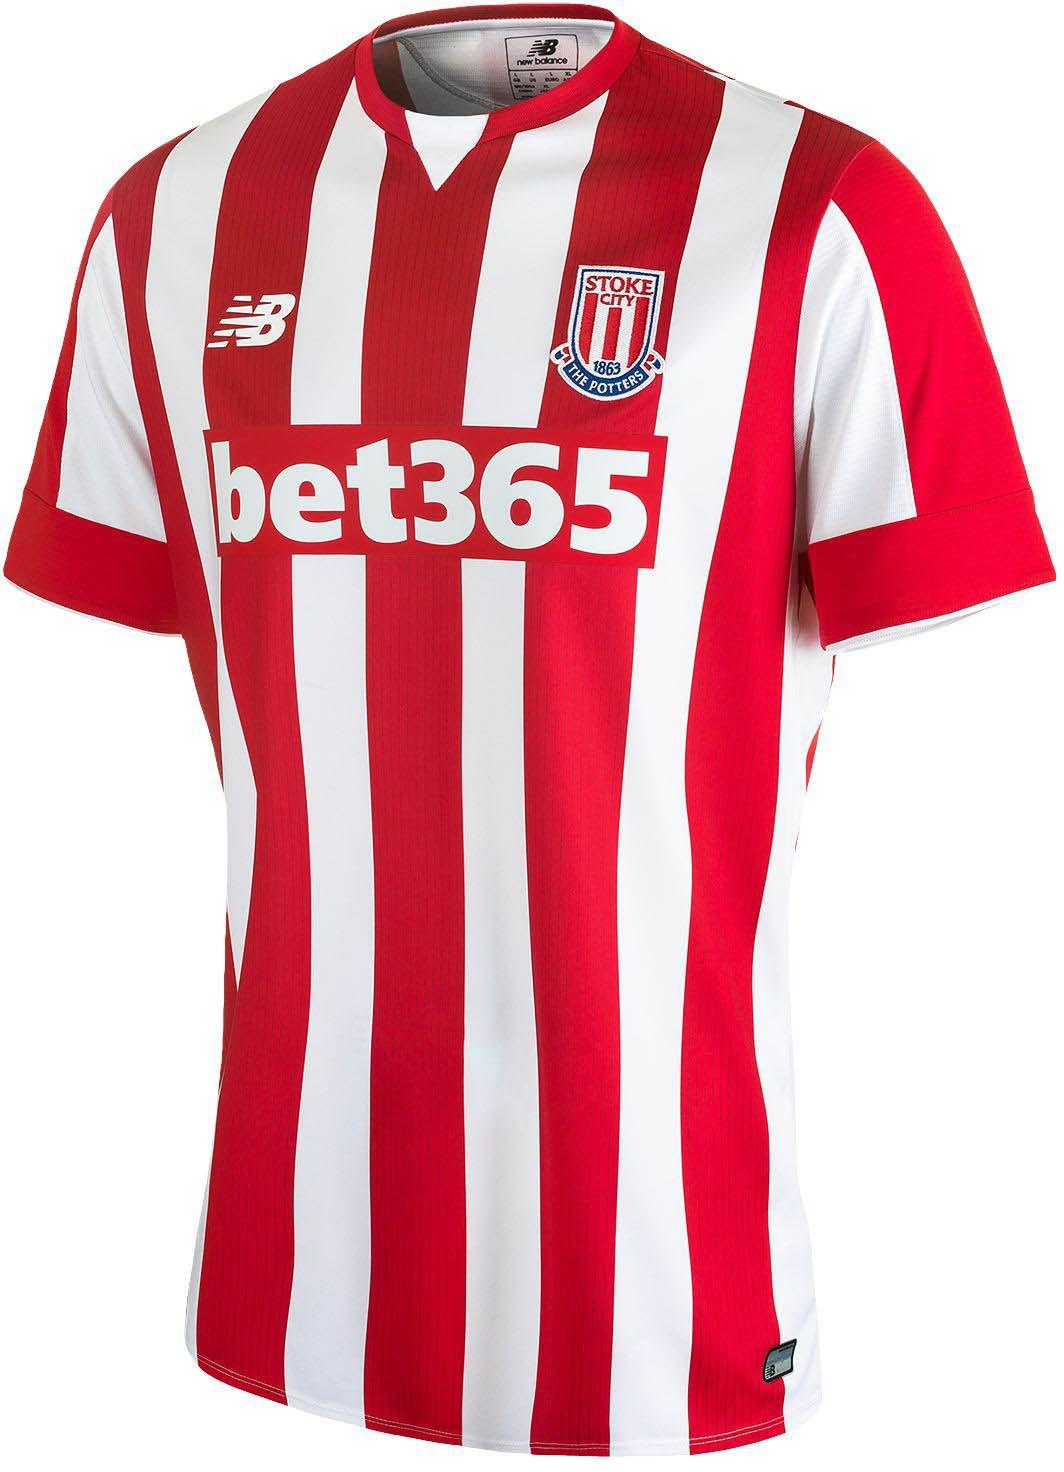 Stoke City 15 16 New Balance Home Football Shirt  22f42e522